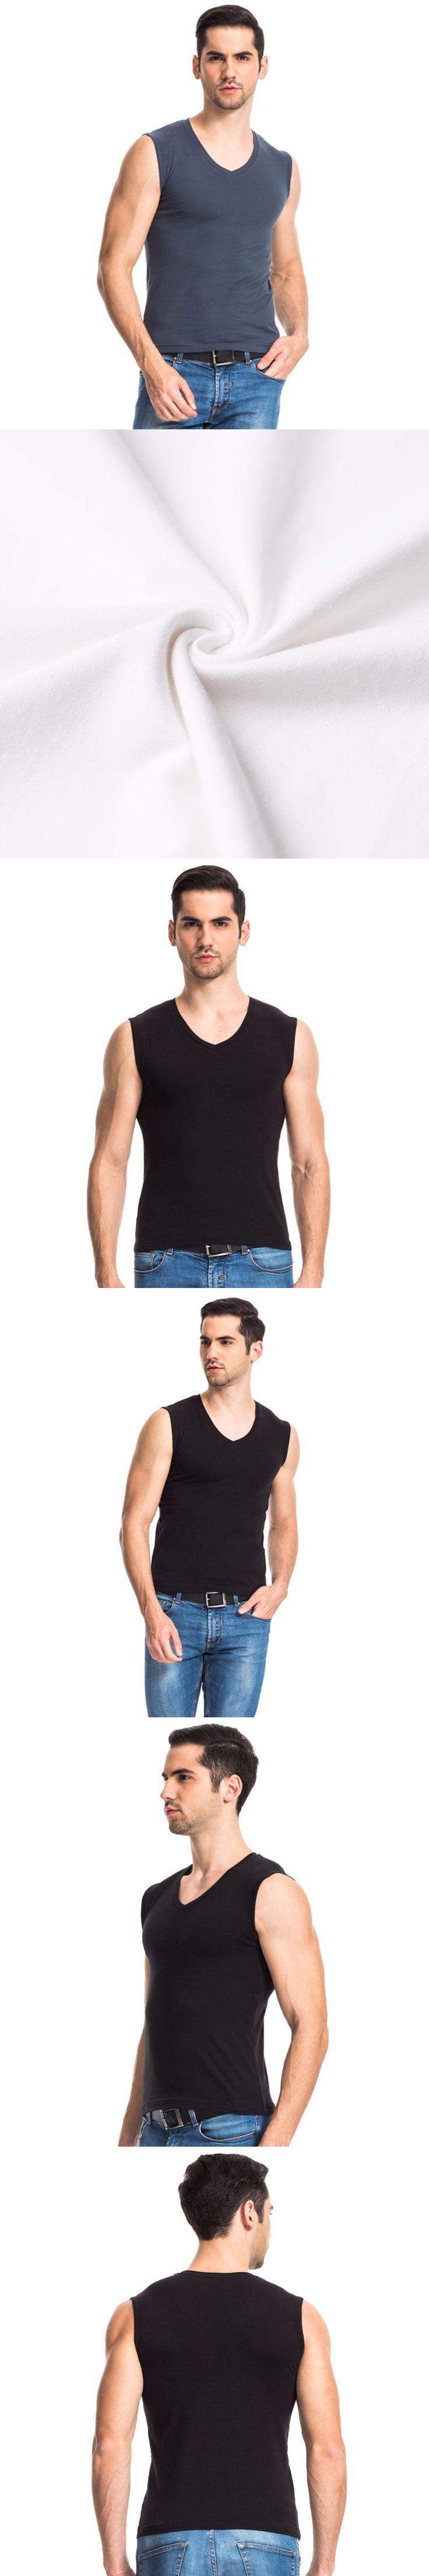 THREEGUN Men's Cotton Tee Bodybuilding tank tops for Muscular Sleeveless Shirts Fitness Male Sexy Vest Casual Tank Tops Lycra